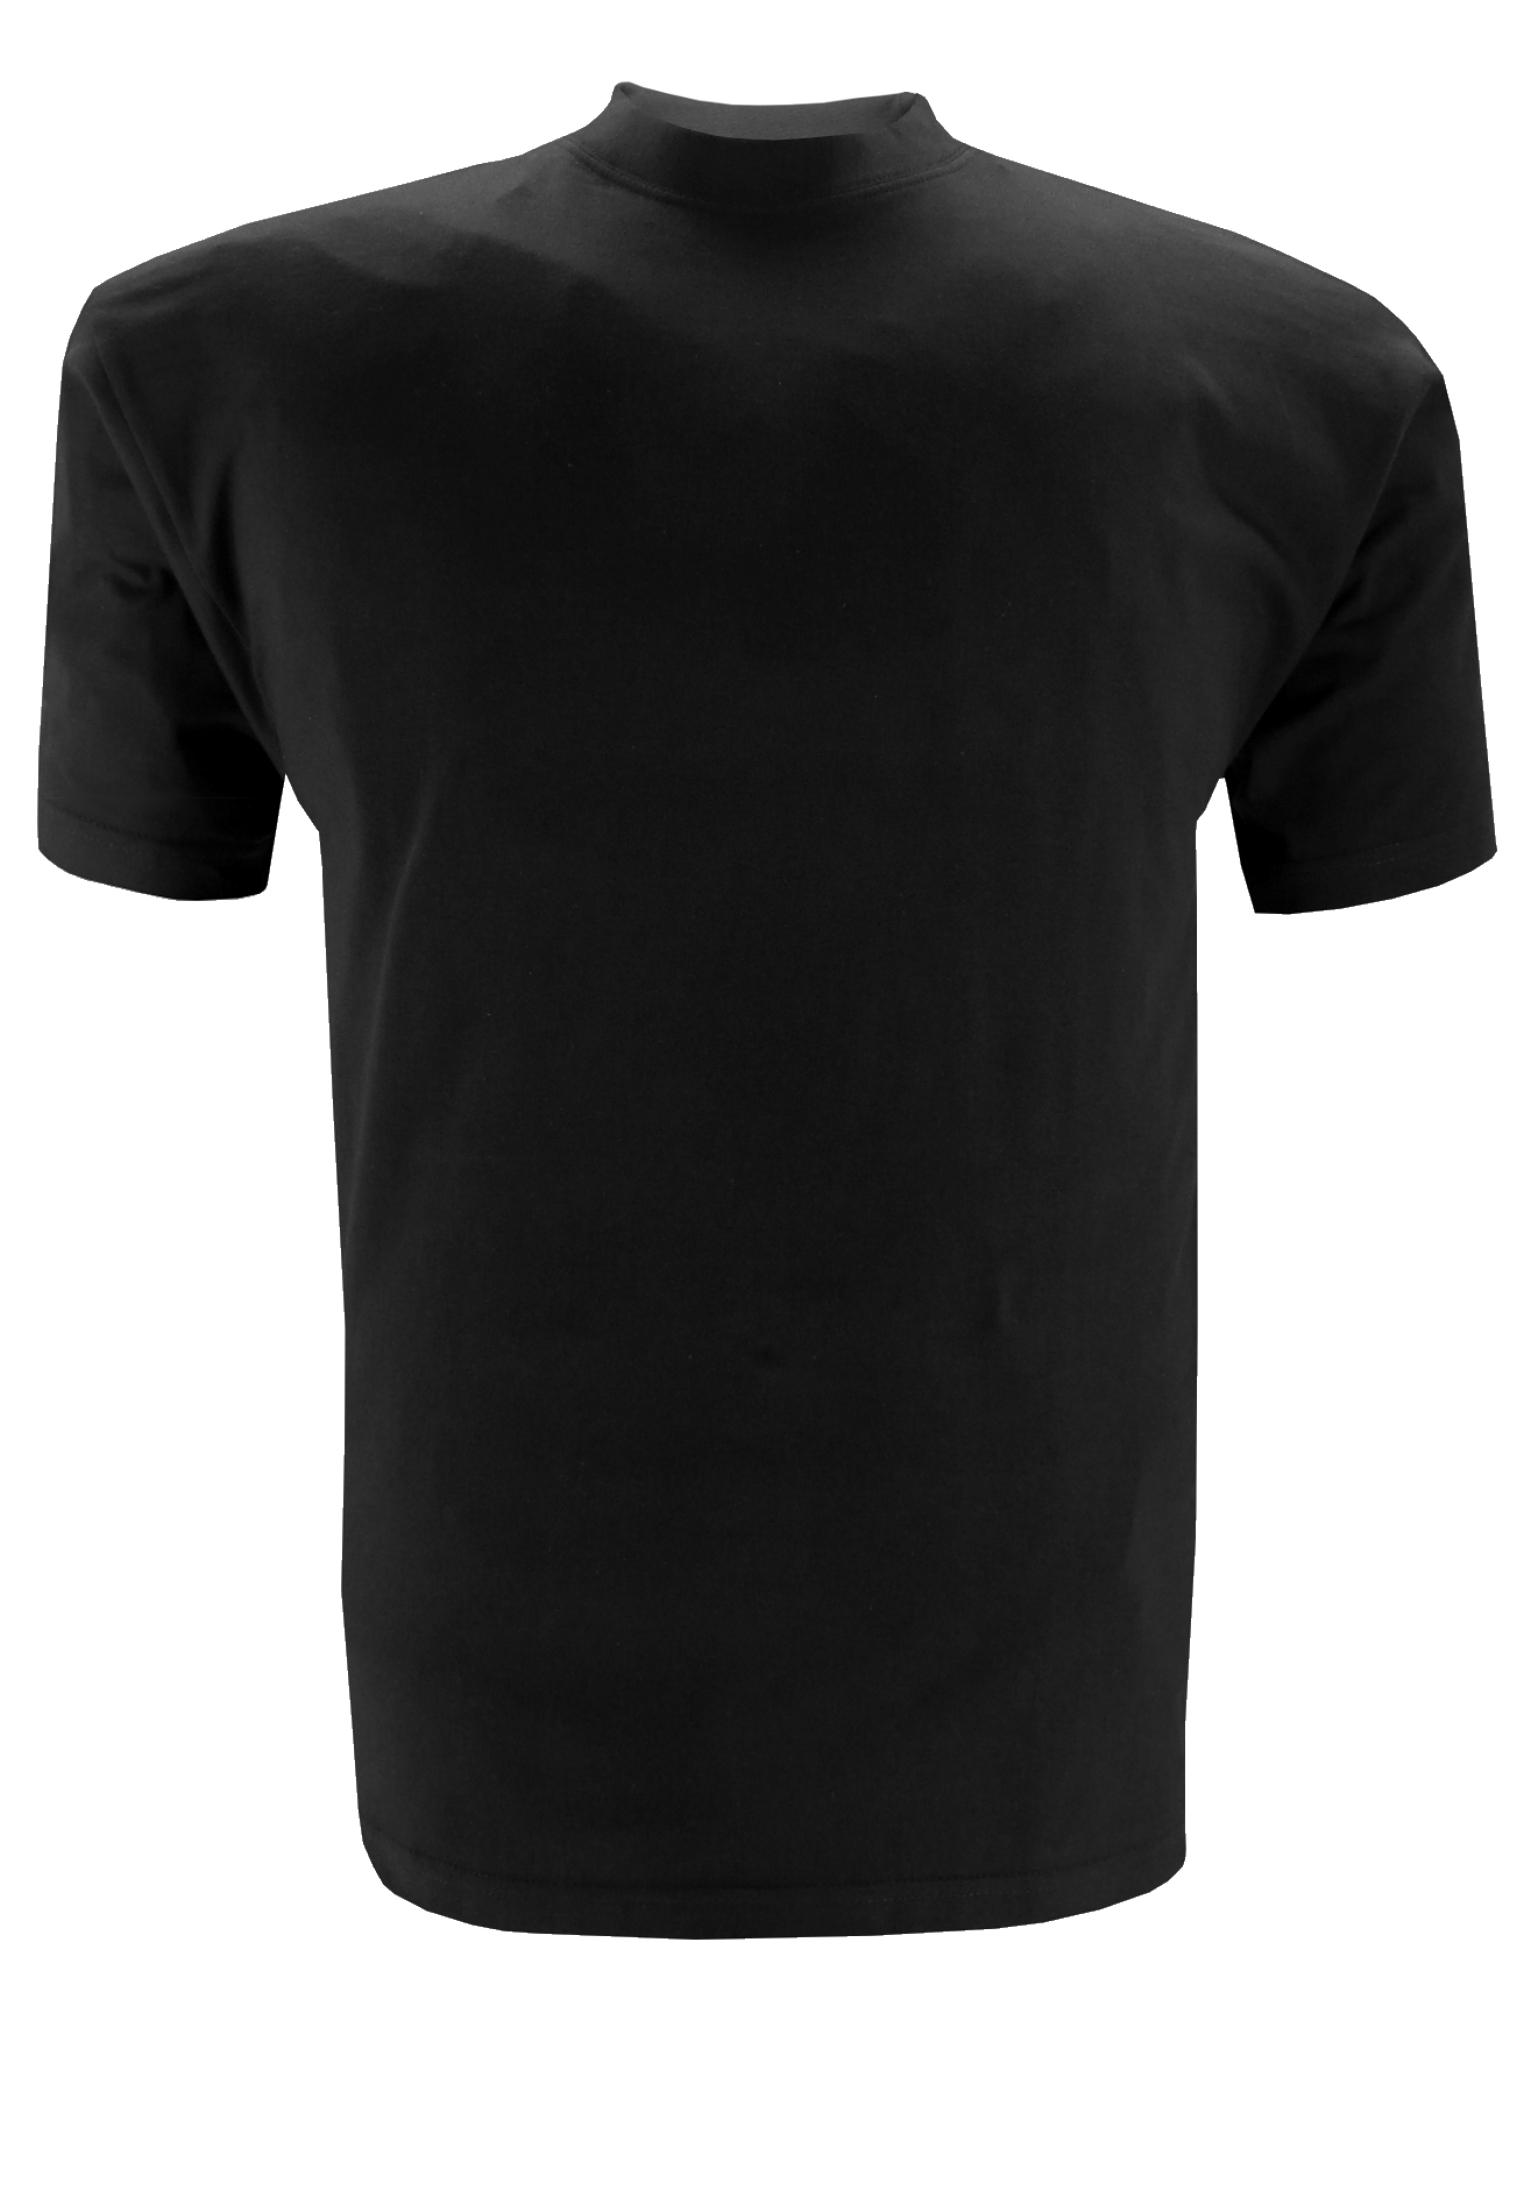 Greyes t-shirt met ronde hals in basic model.